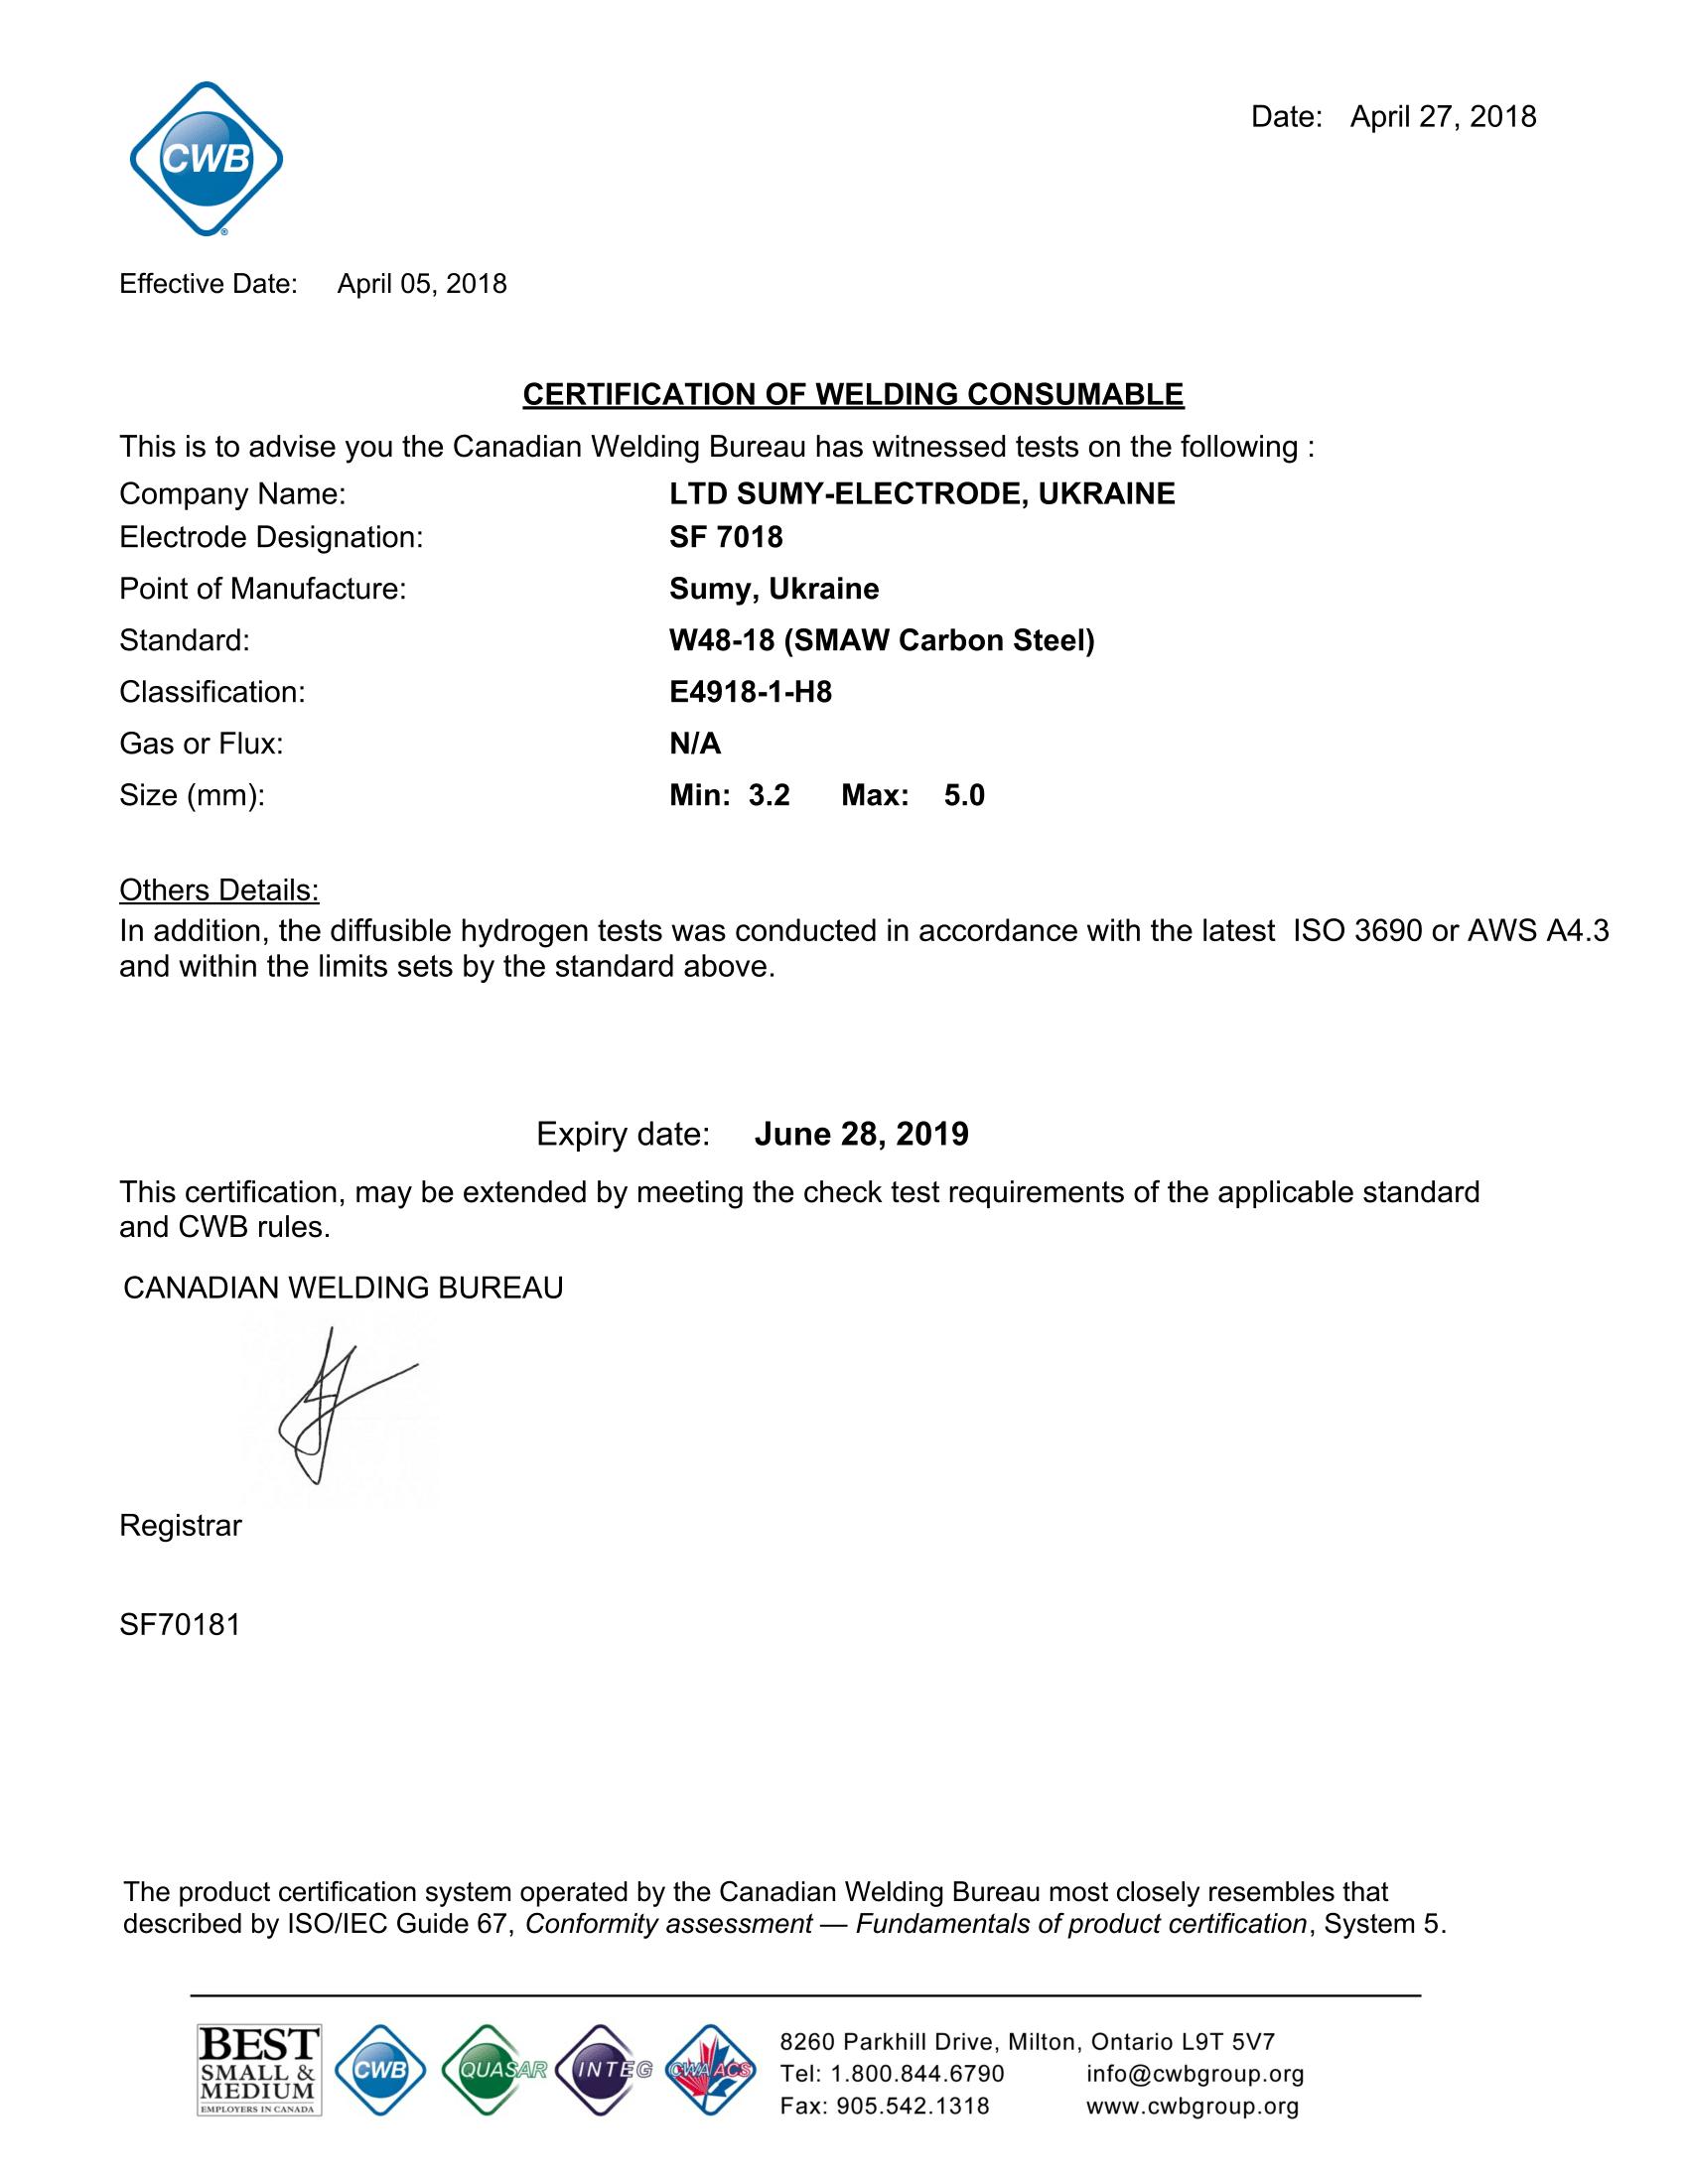 SF7018-1-1